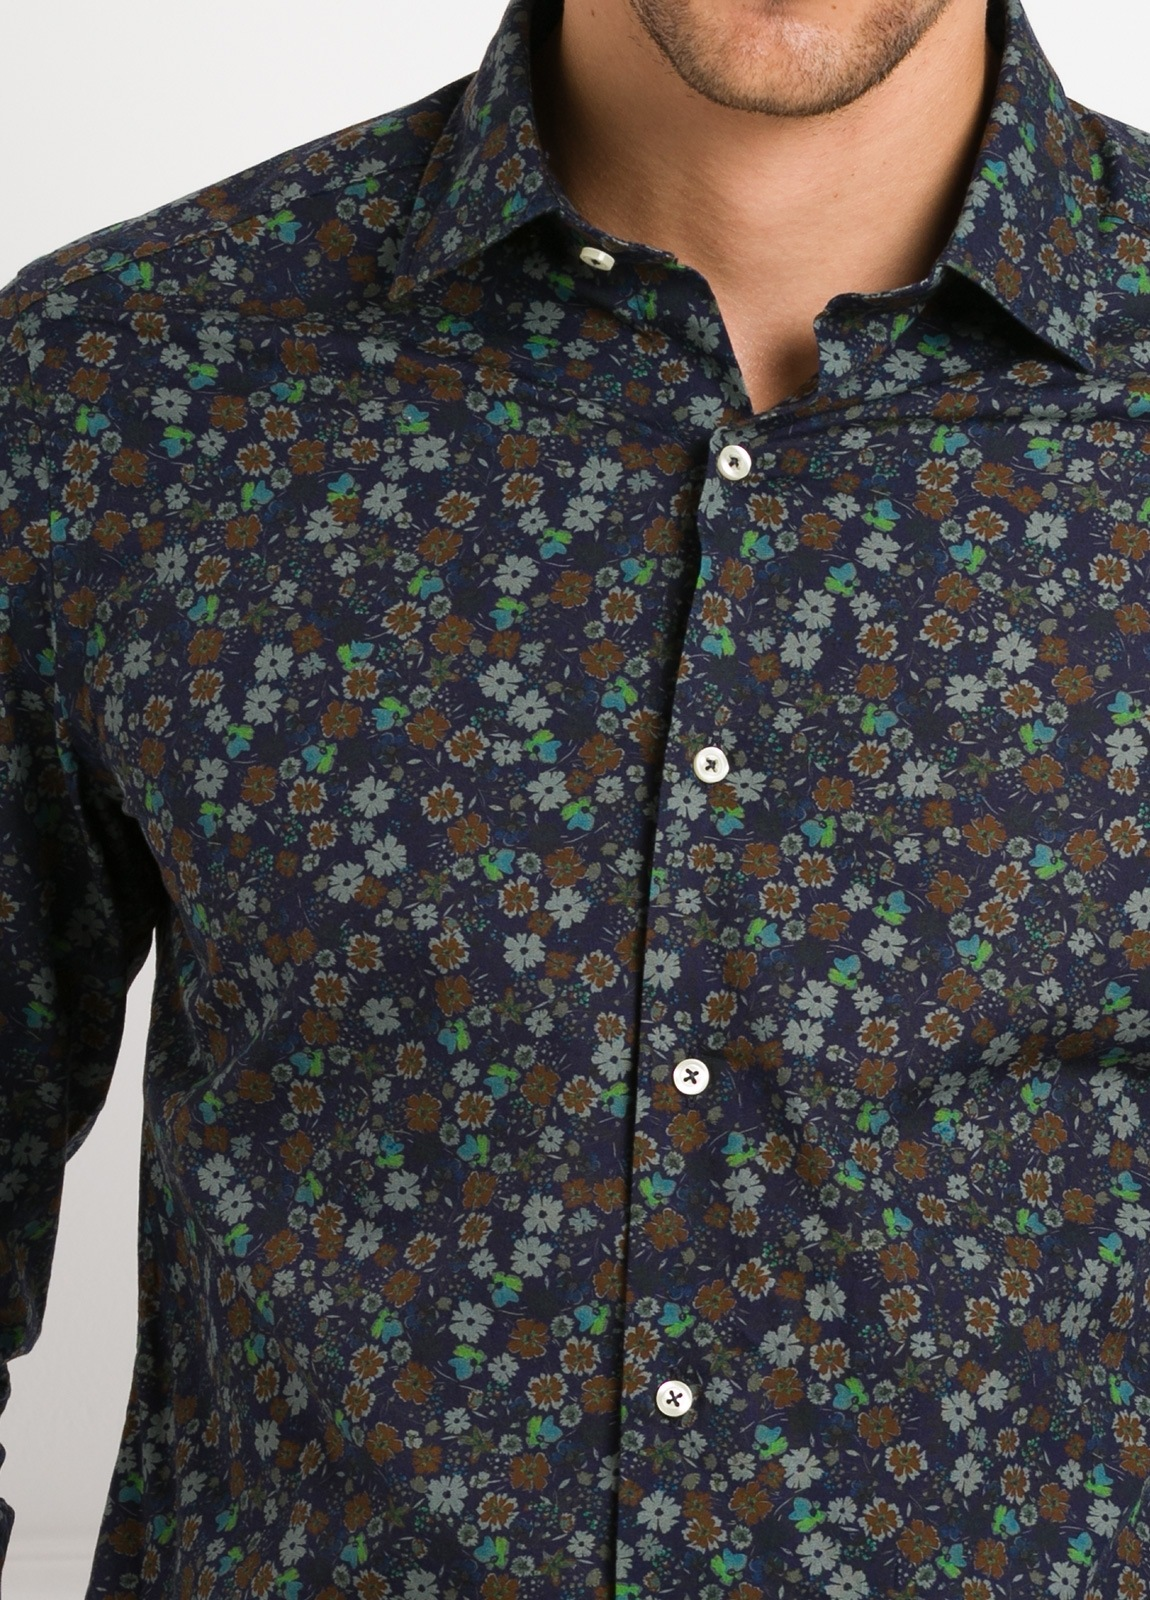 Camisa Leisure Wear SLIM FIT modelo PORTO estampado flores color azul. 100% Algodón. - Ítem2